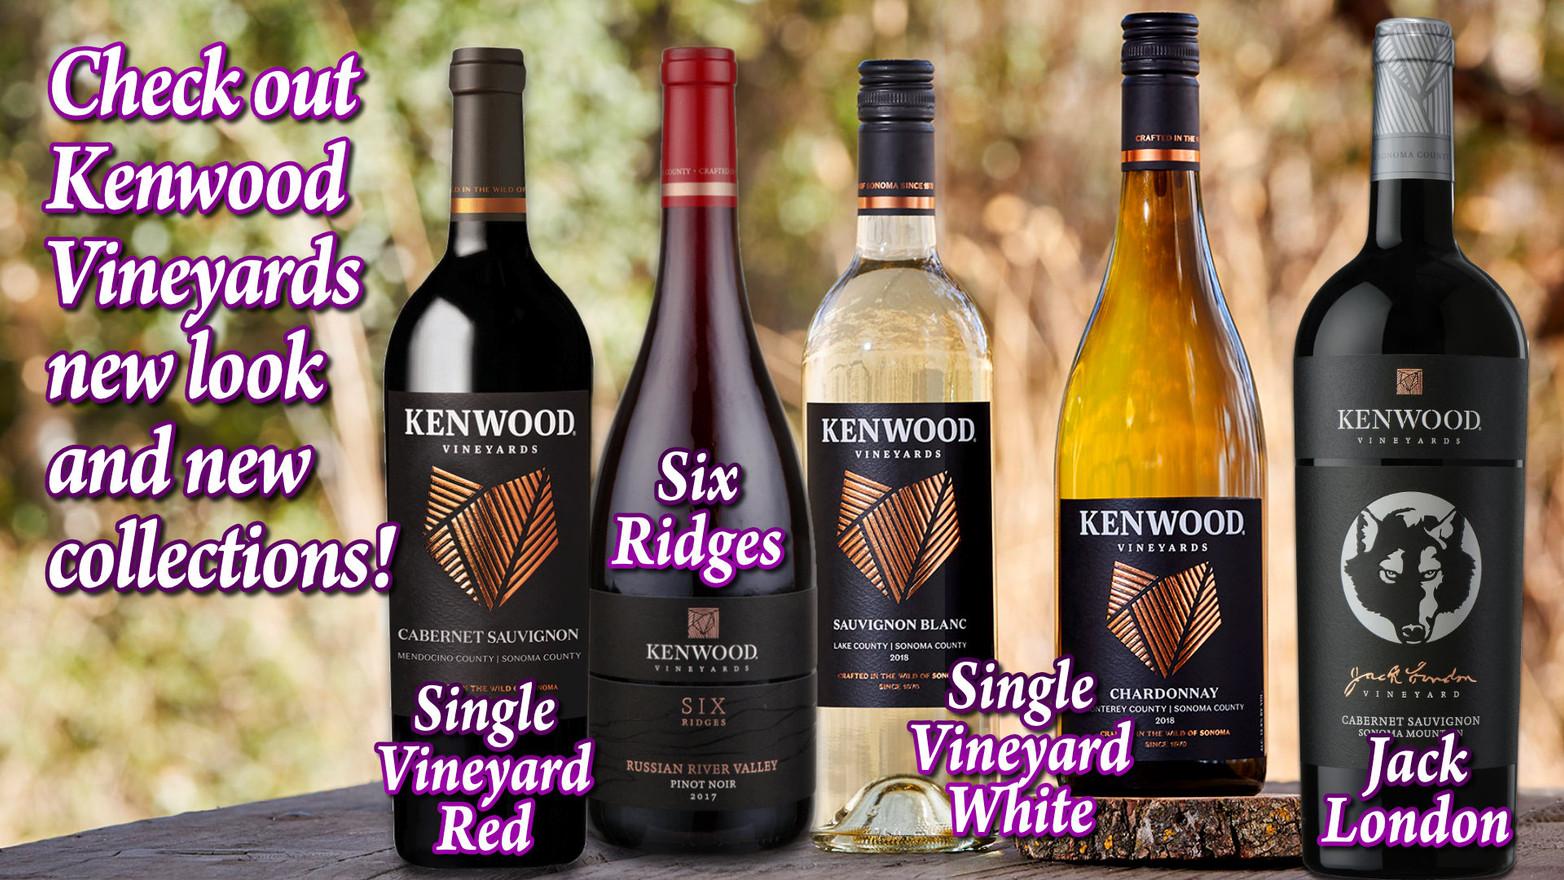 kenwood promo.jpg